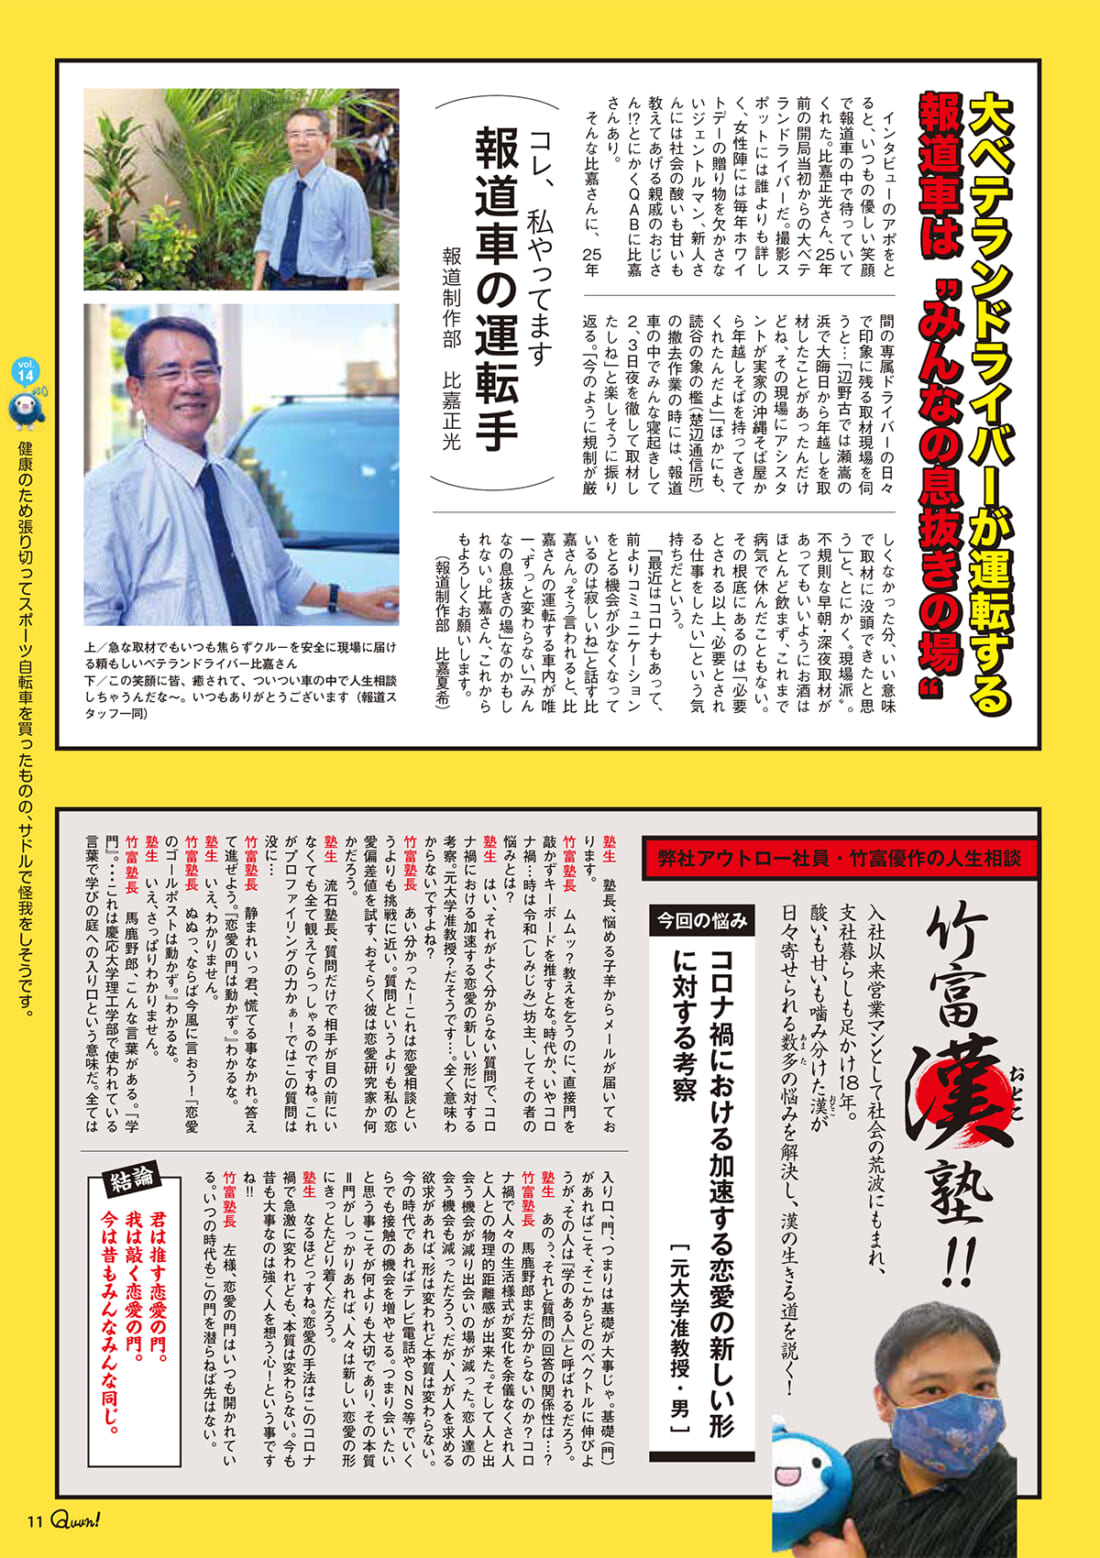 https://www.qab.co.jp/qgoro/wp-content/uploads/quun_1413-1100x1558.jpg